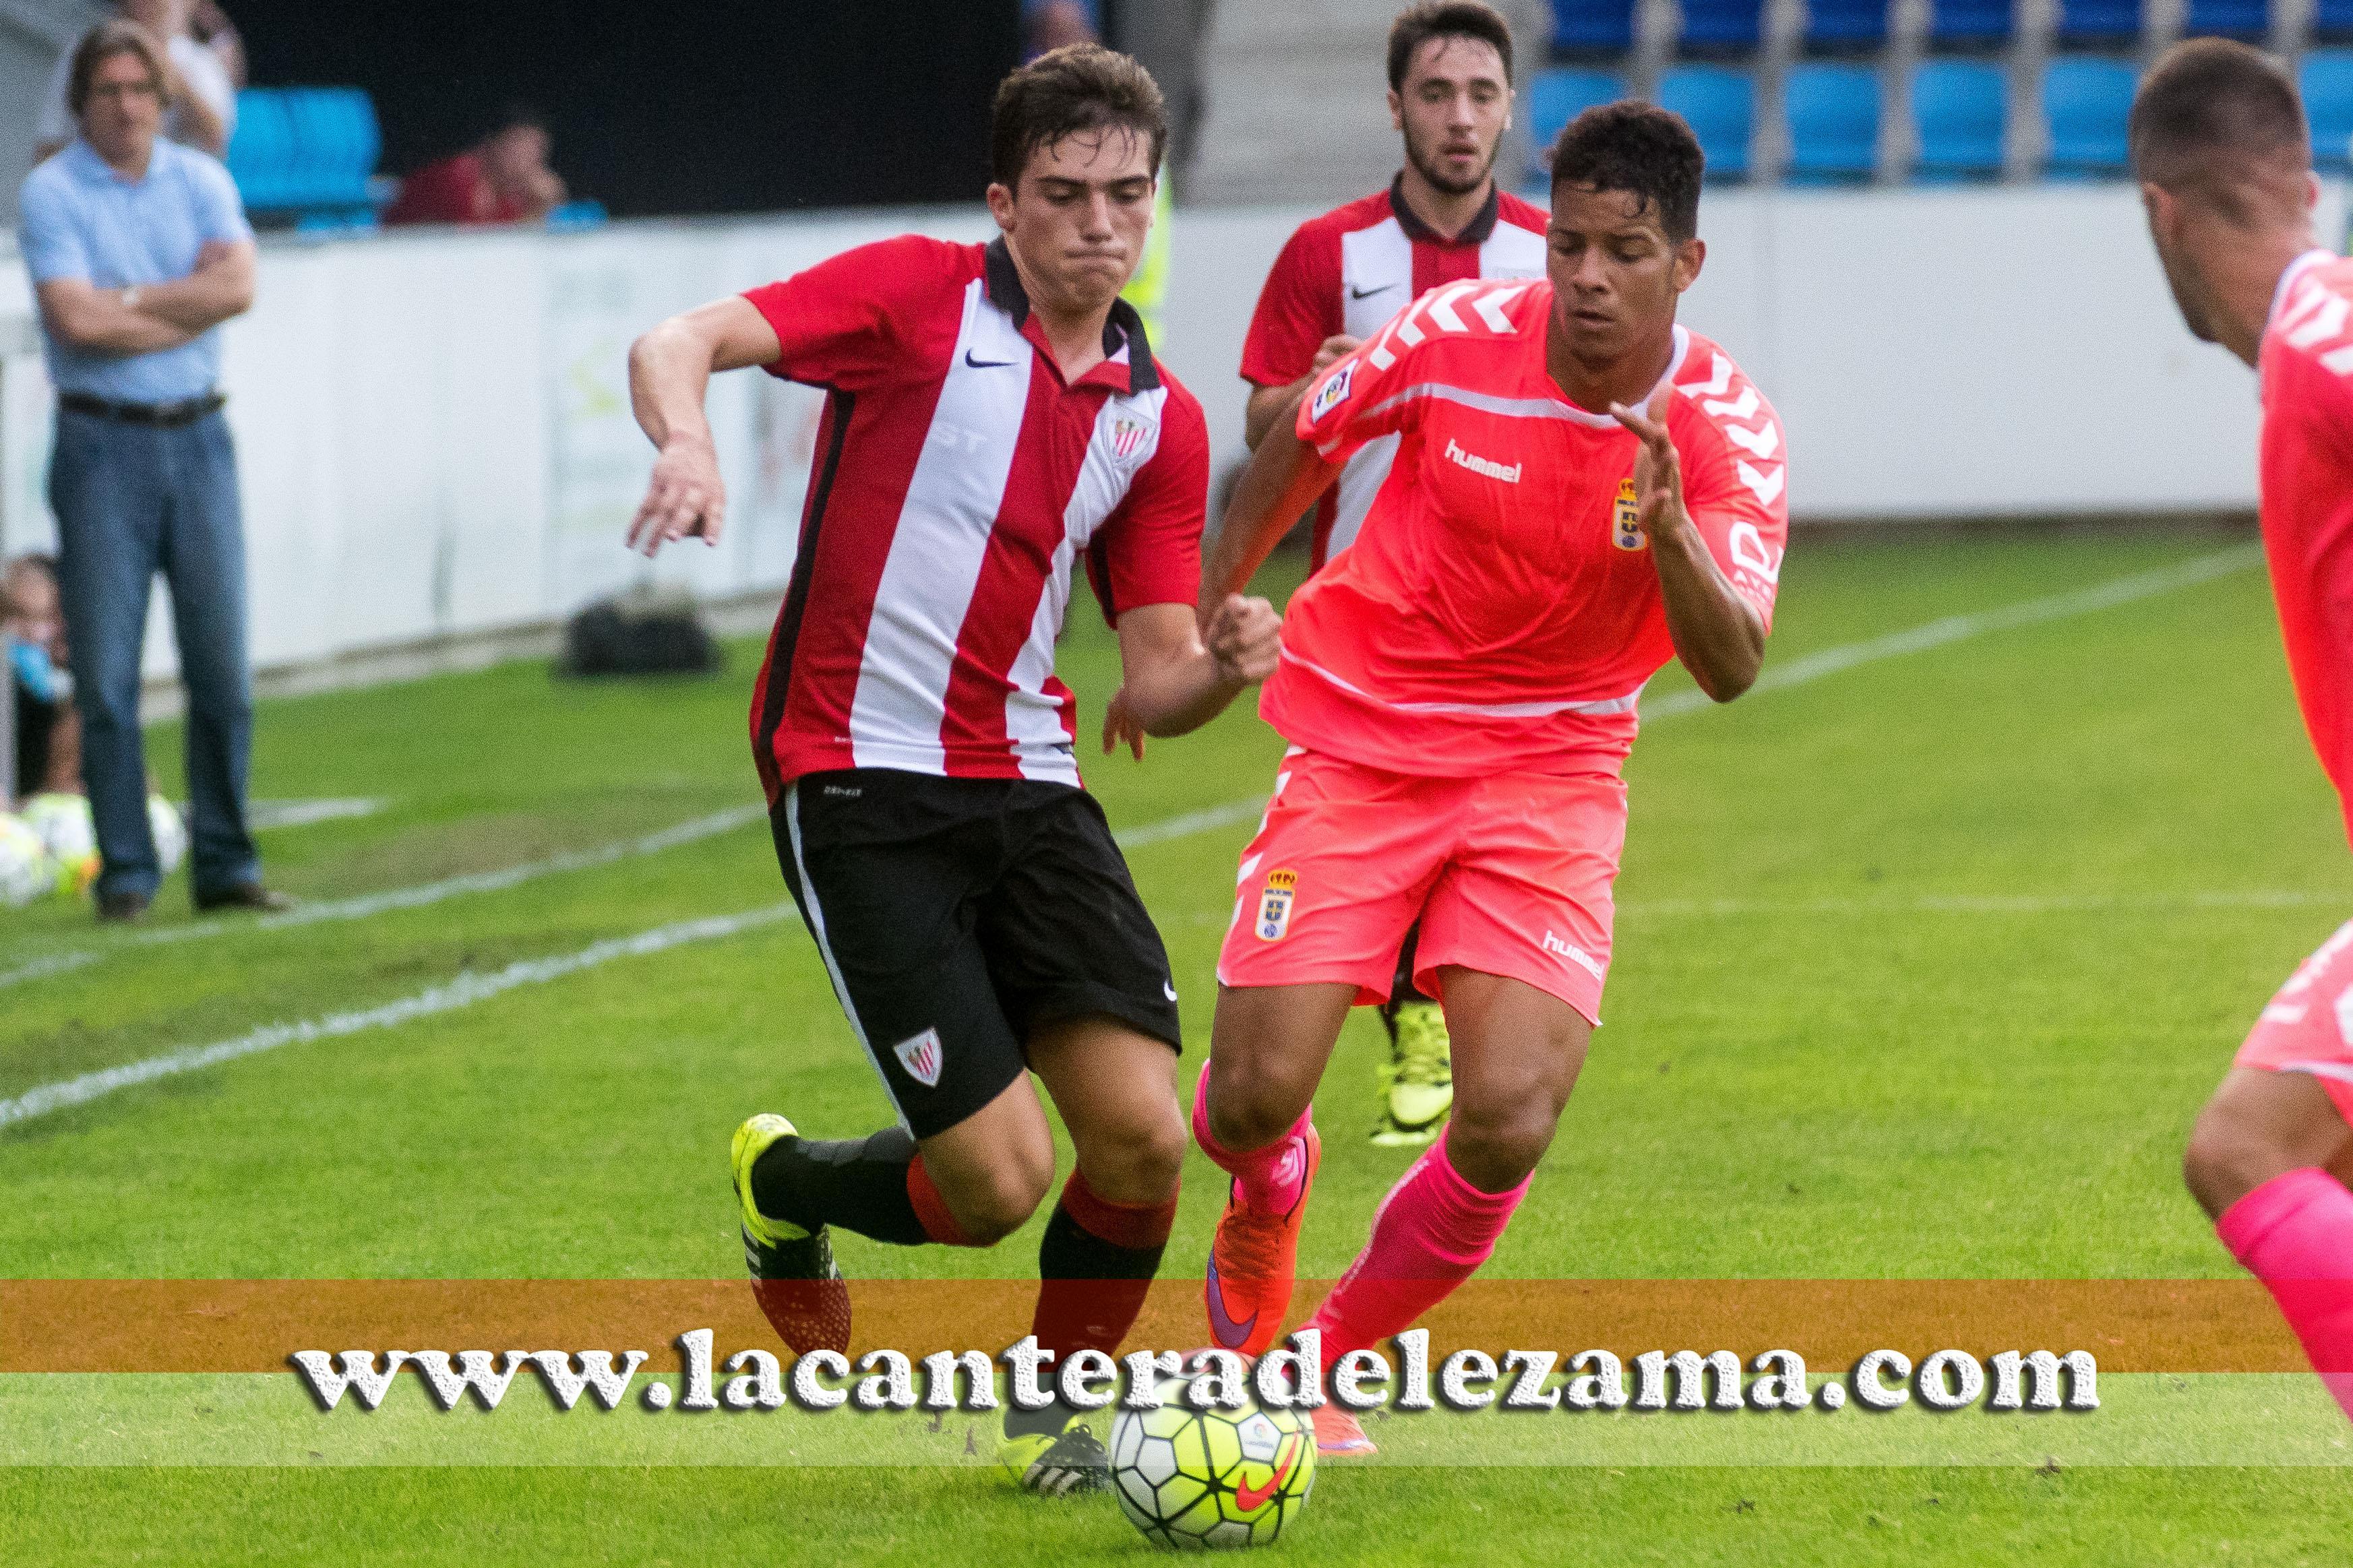 Iñigo Cordoba ante el Oviedo en pretemporada | Foto: Unai zabaleta